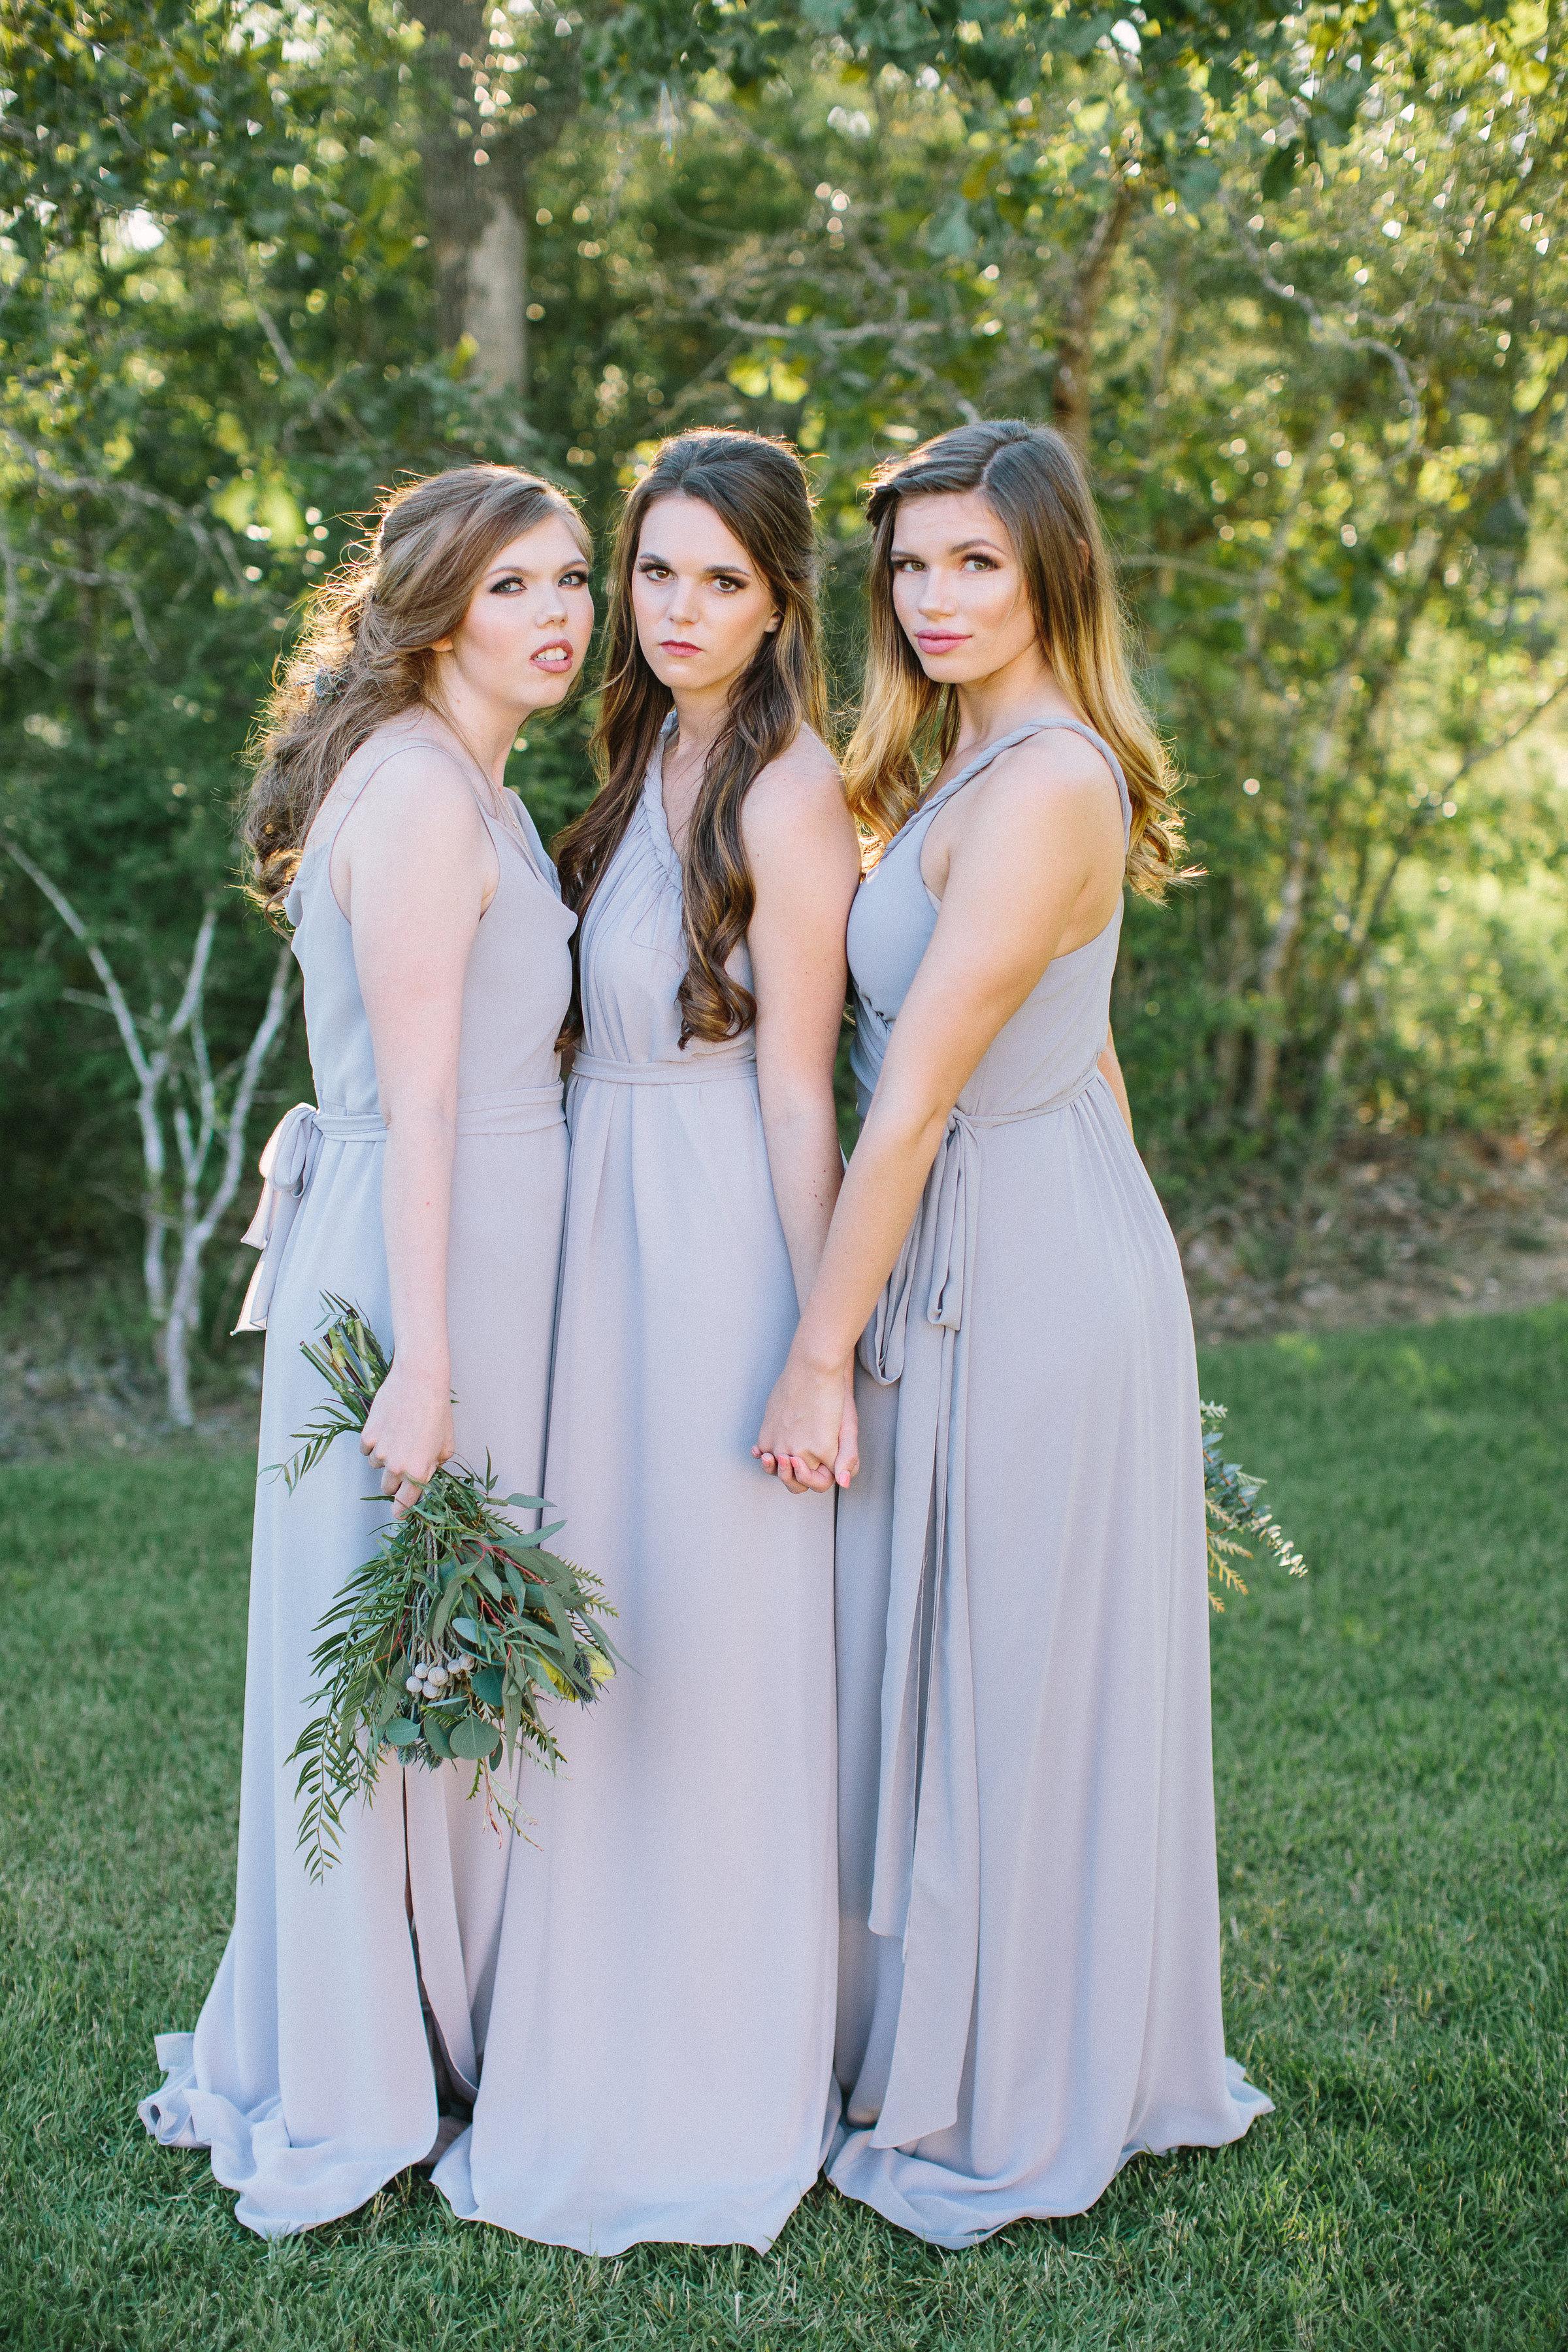 Ellen-Ashton-Photography-Peach-Creek-Ranch-Weddings-Wed-and-Prosper184.jpg